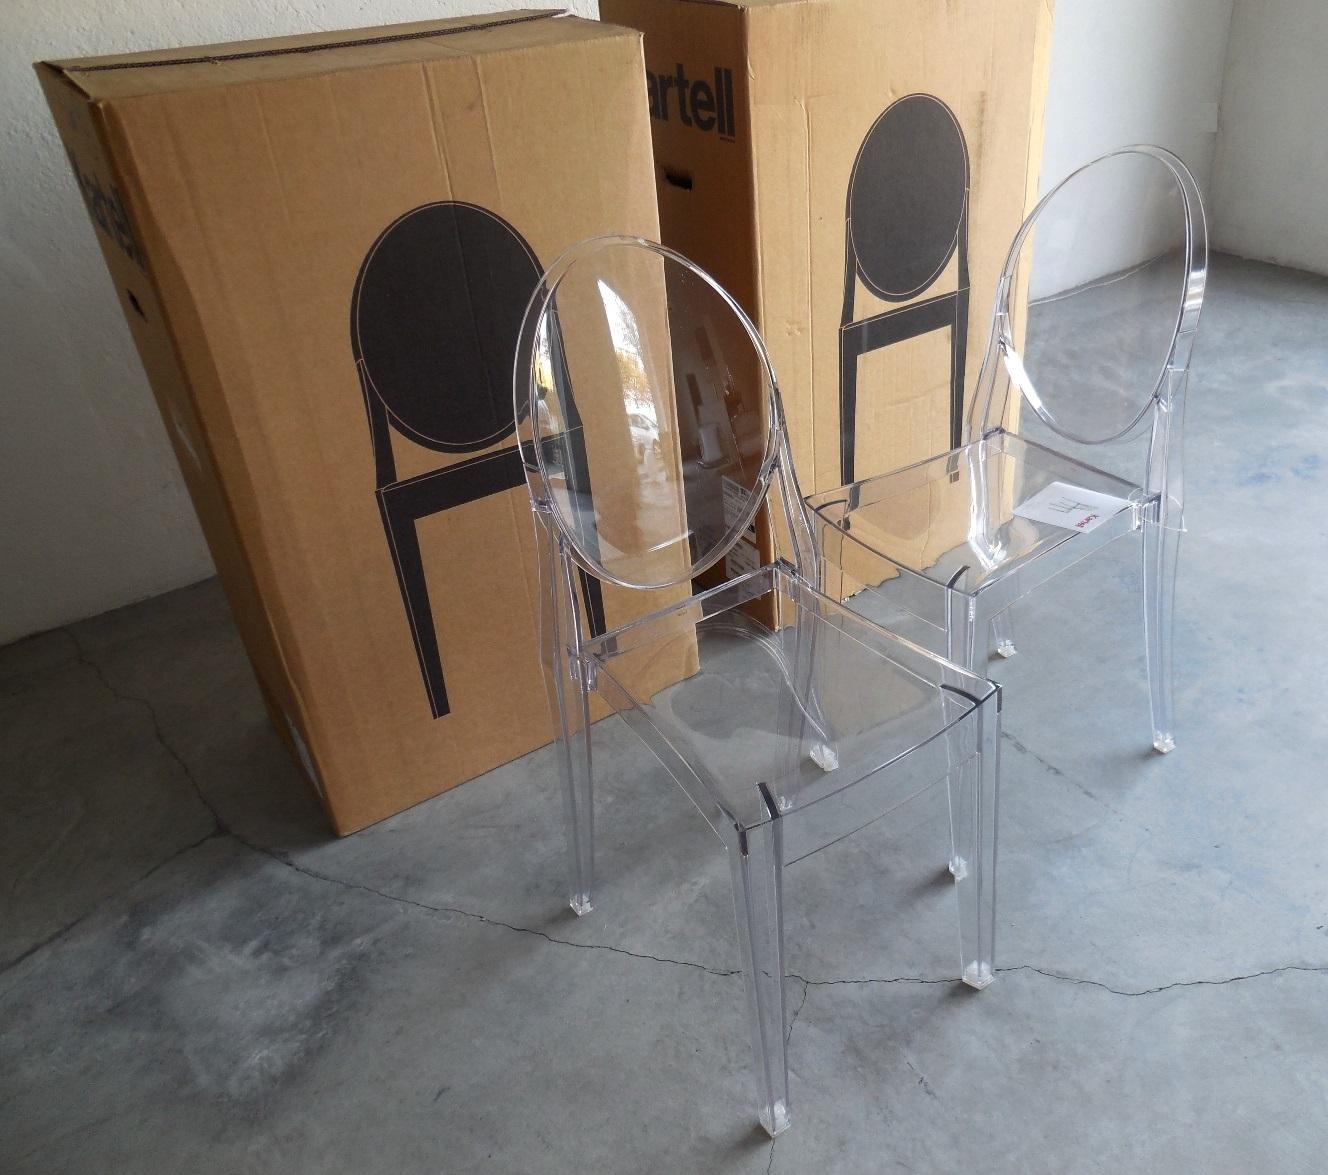 Sedia kartell vendita online victoria ghost set 4 sedie for Vendita online sedie